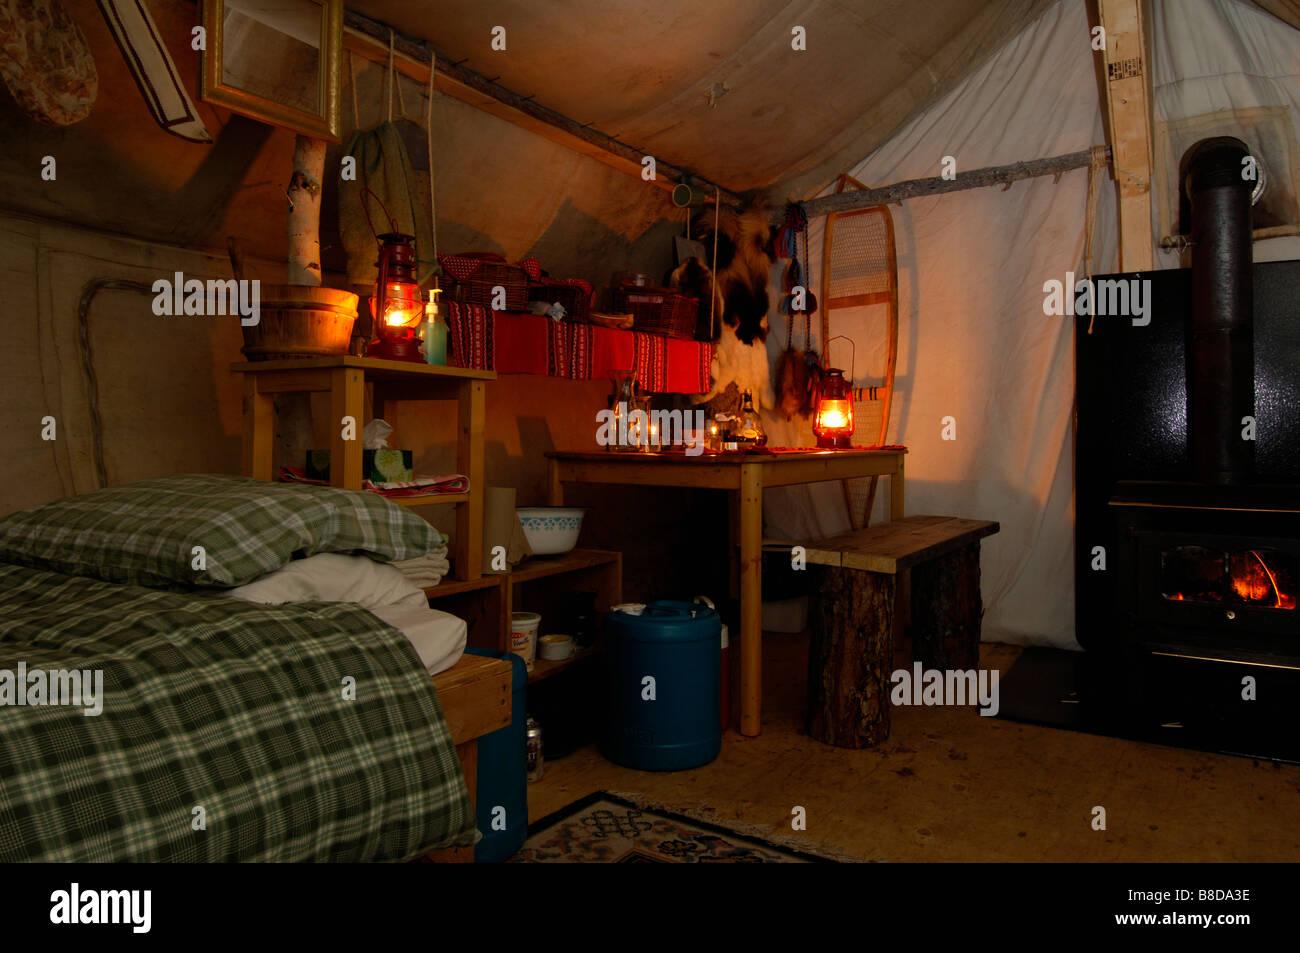 Inside Prospectors Tent, Blachford Lake, Northwest